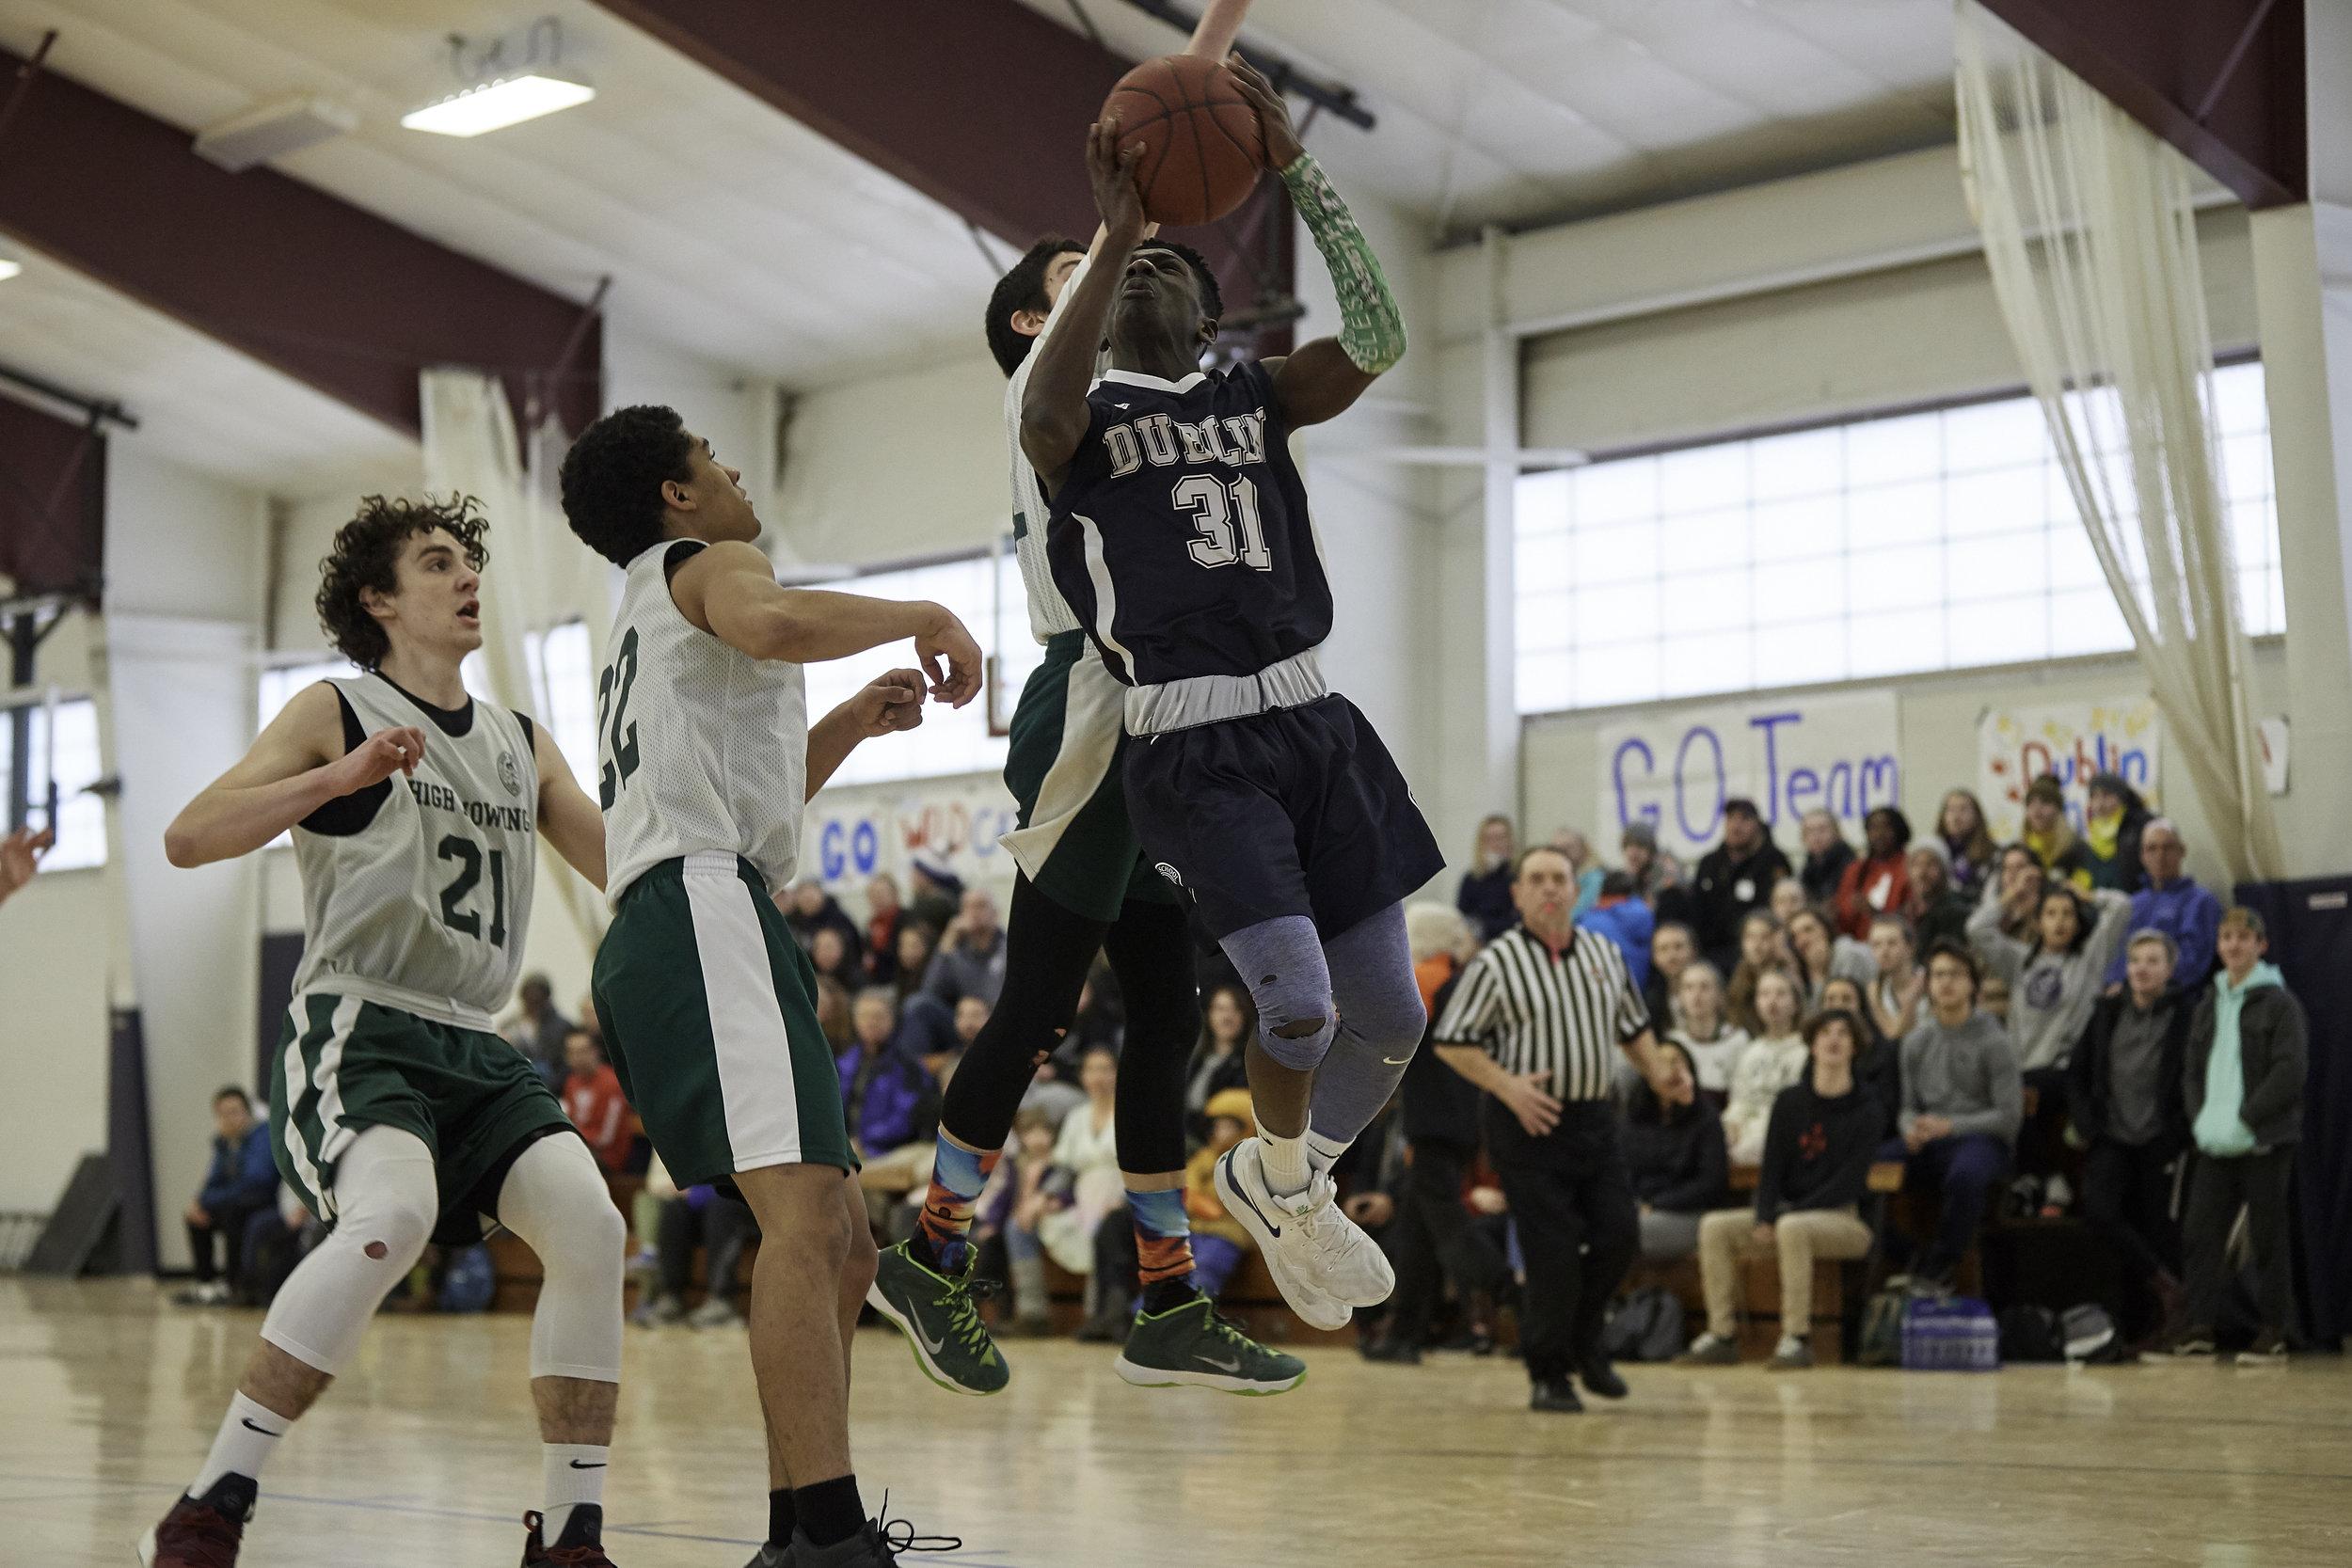 Boys Varsity Basketball vs High Mowing School - Feb 02 2019 - 0026.jpg